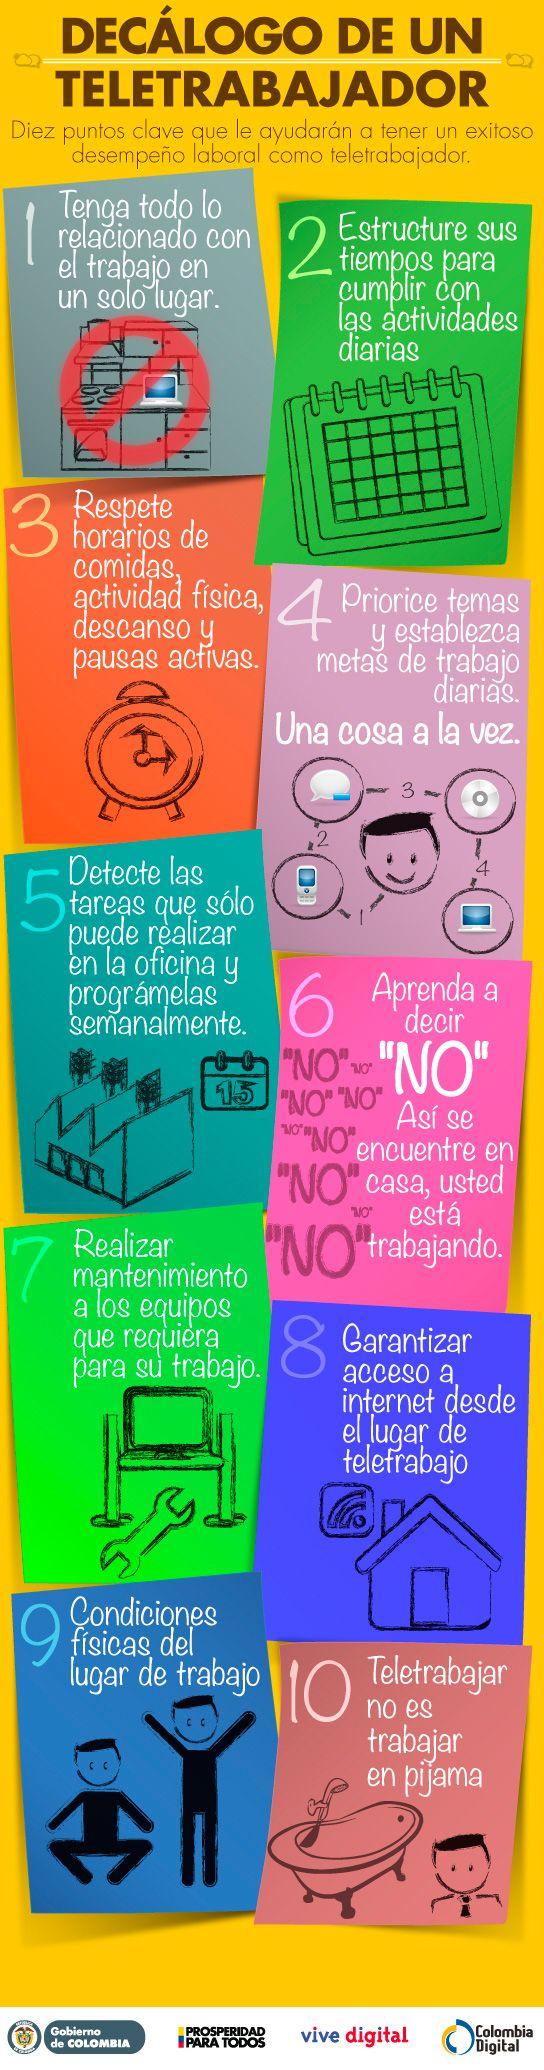 10 consejos para un teletrabajador #infografia #infographic #empleo